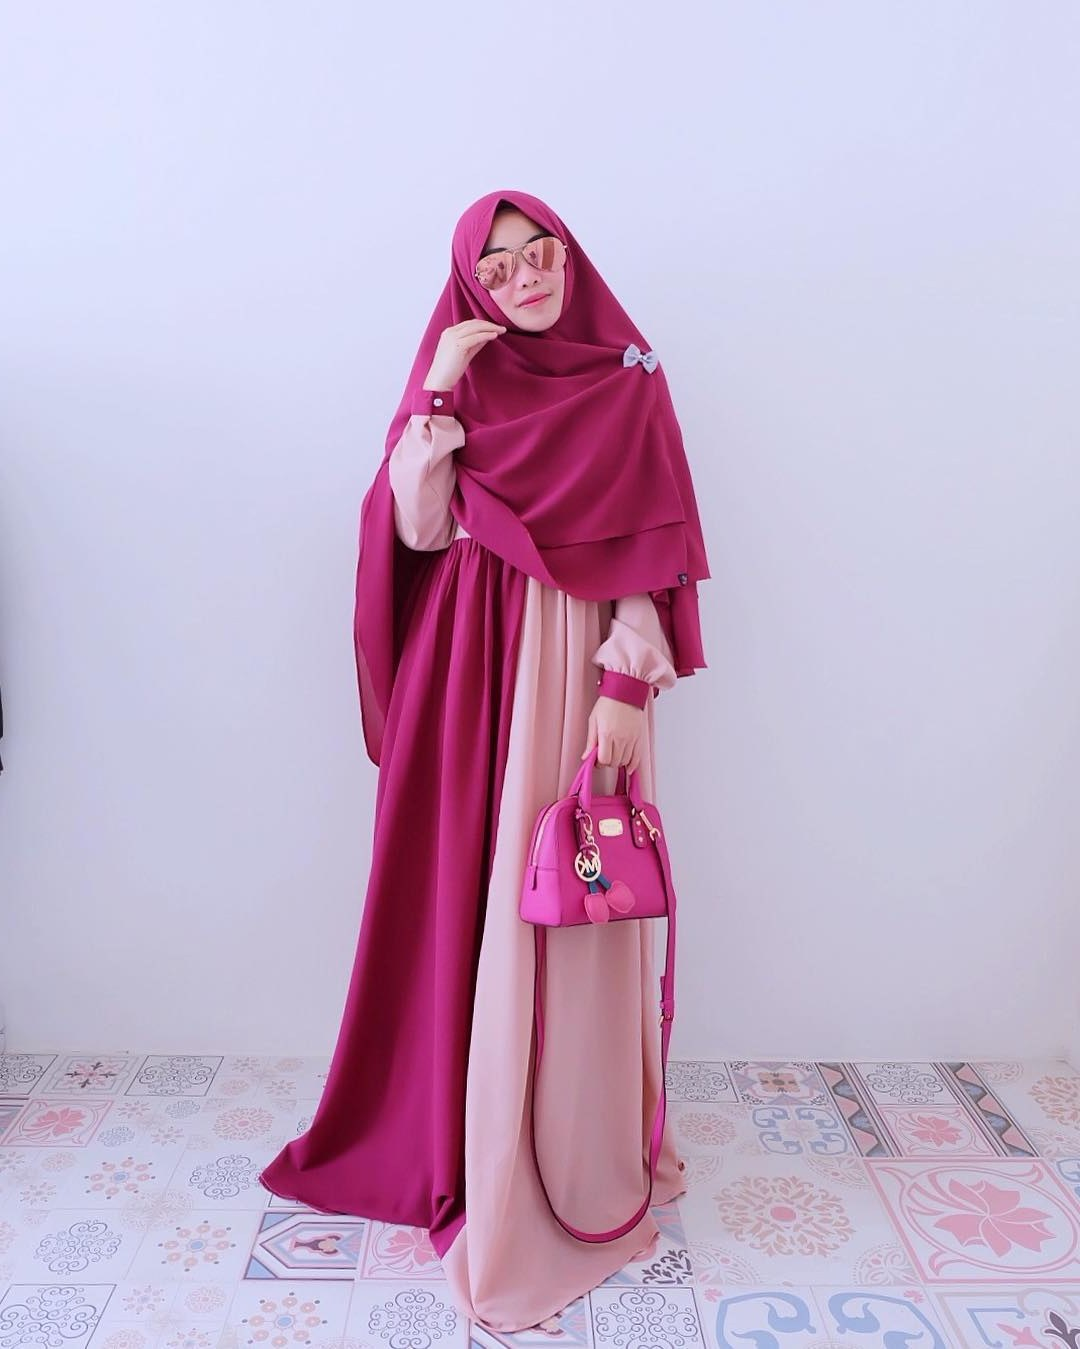 Inspirasi Baju Lebaran Syari 2018 O2d5 21 Model Gamis Lebaran 2018 Desain Elegan Casual Dan Modern